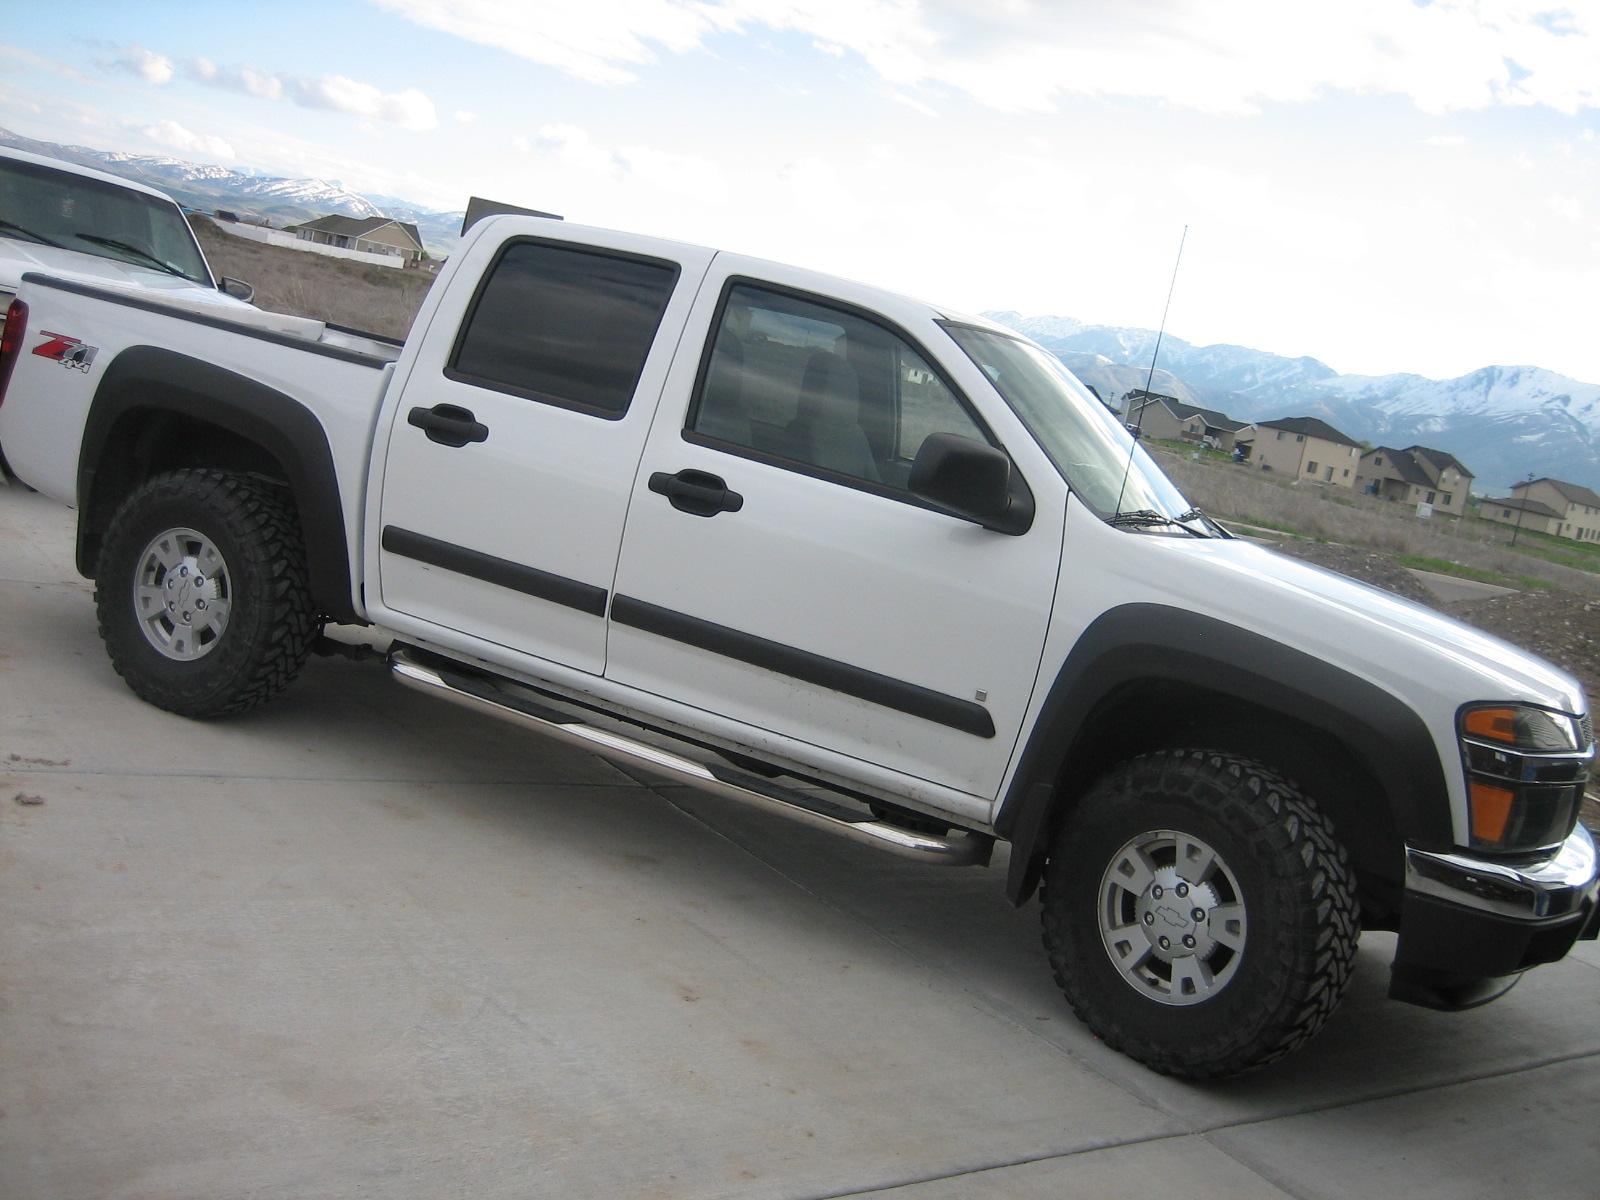 Craigslist San Antonio Tx Cars And Trucks Craigslist San Antonio Tx Cars And Trucks With